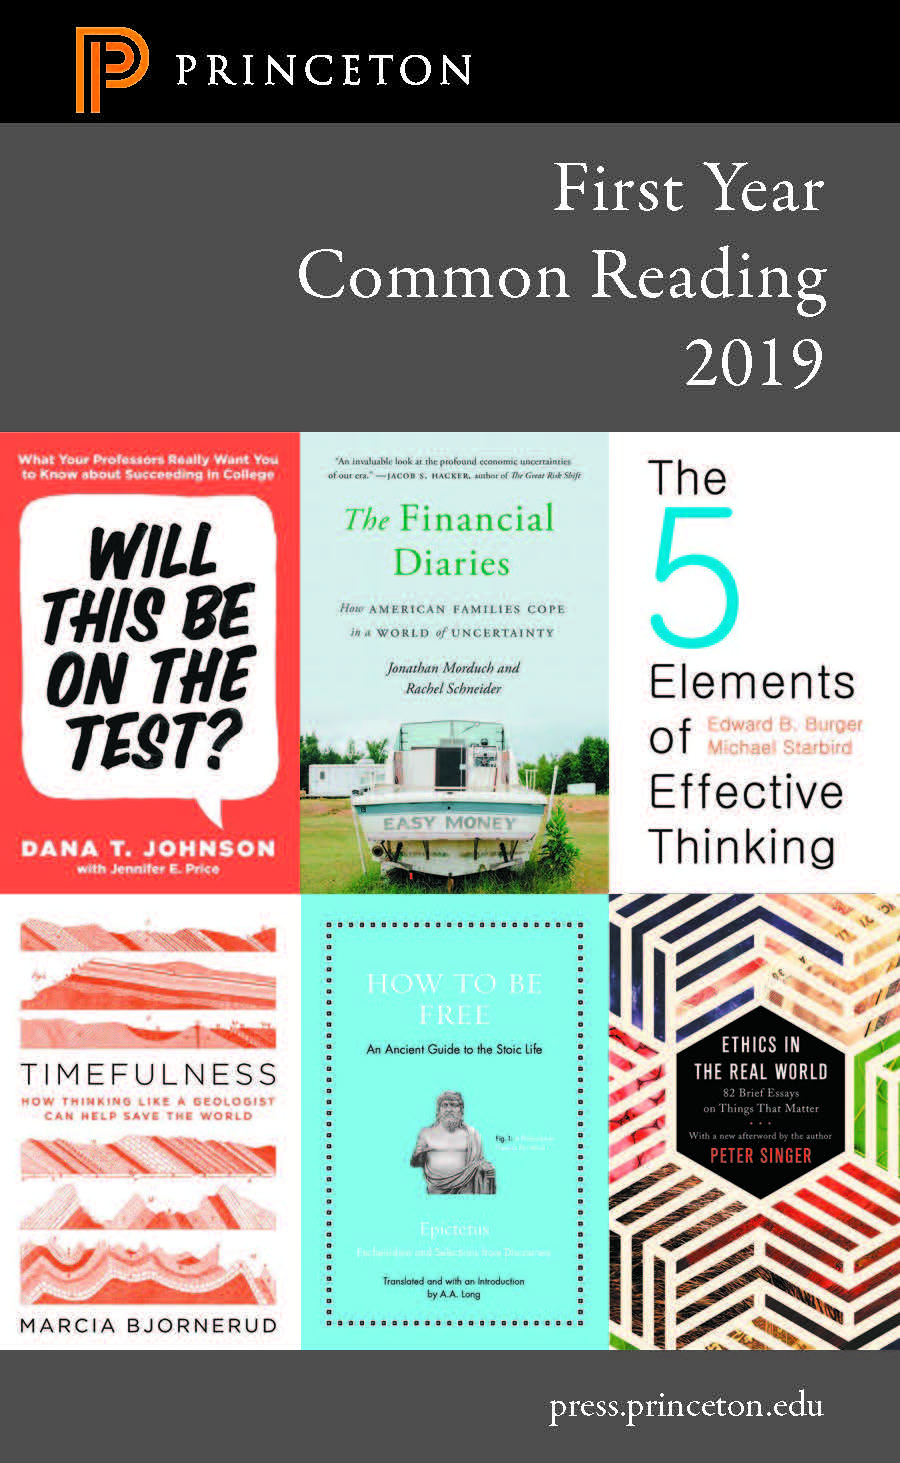 Common Reading Catalog